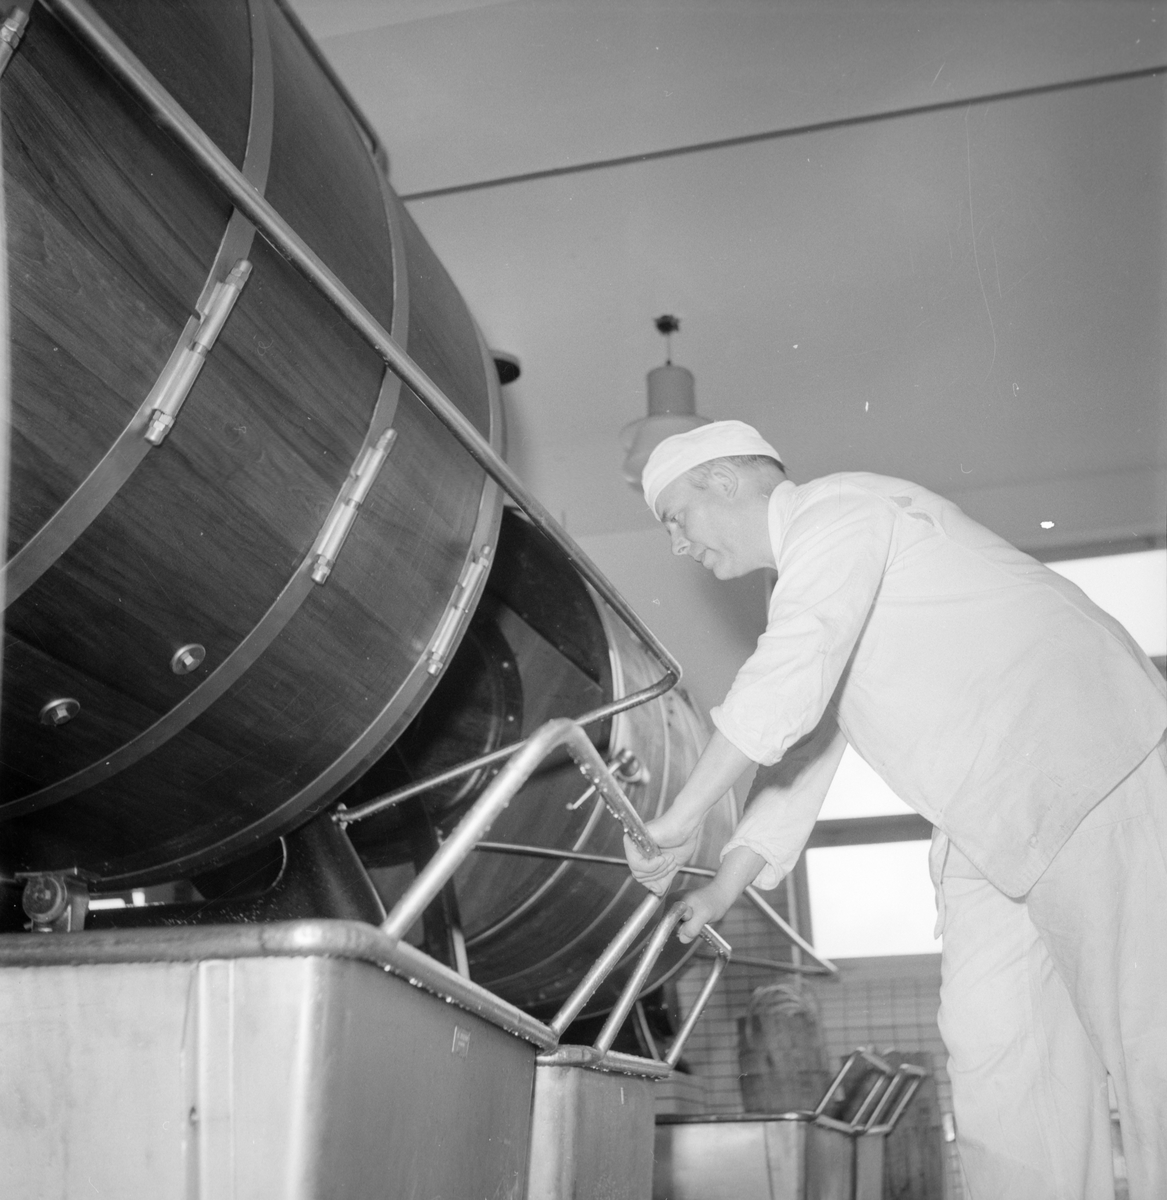 Gävle Mejeri. 9 augusti 1953. Reportage Gefle Dagblad.